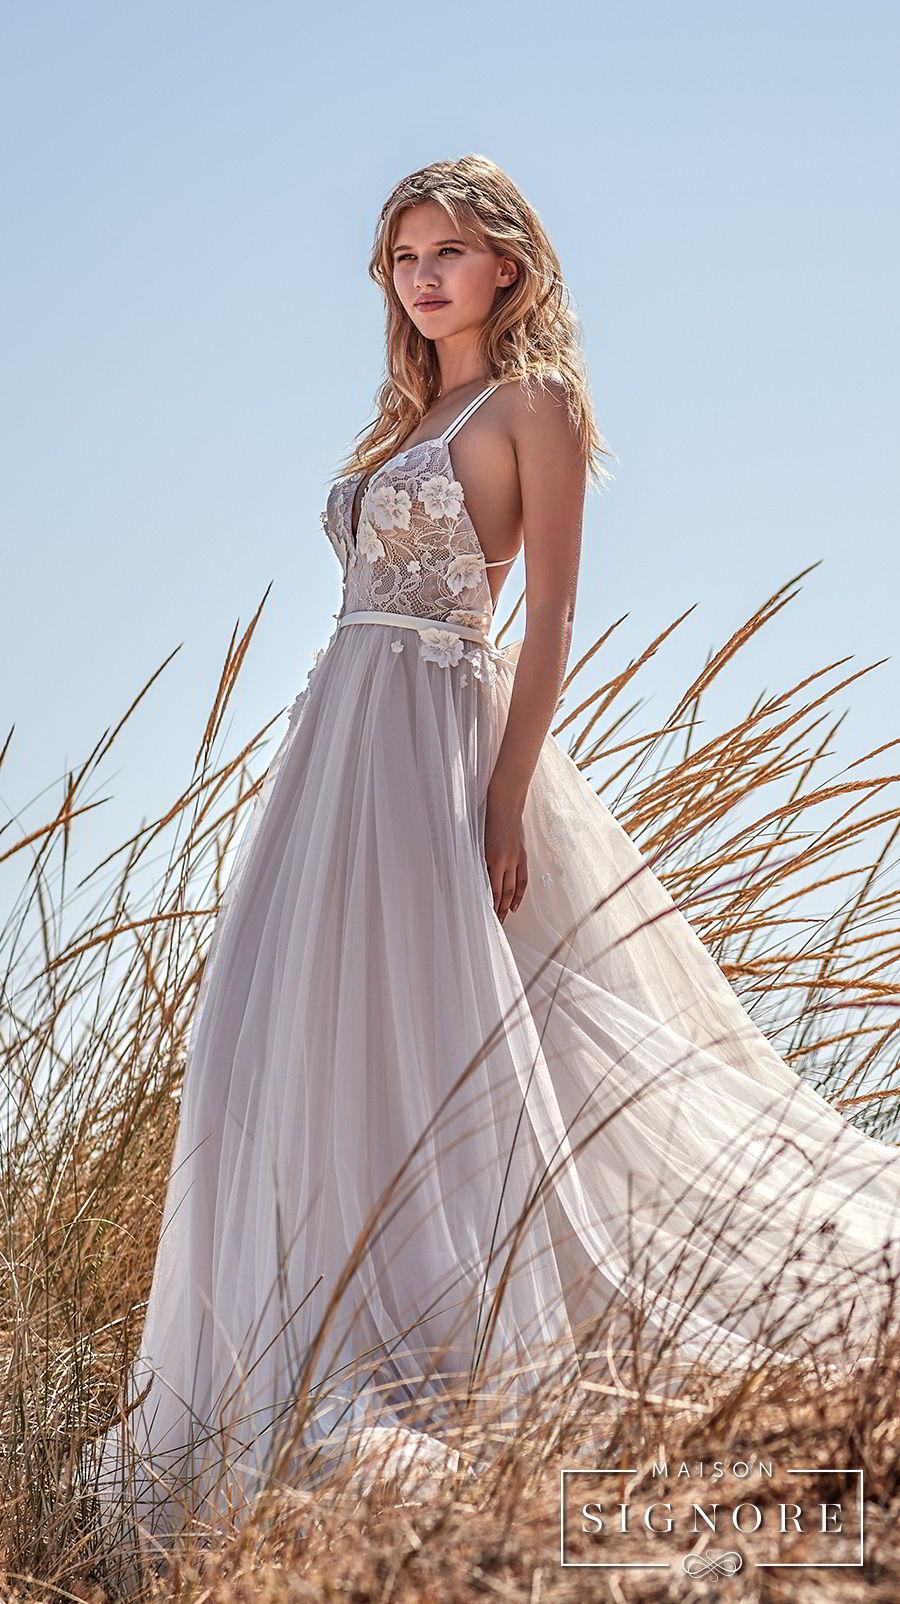 maison signore 2018 bridal thin strap sweetheart neckline heavily embellished bodice tulle skirt romantic a line wedding dress chapel train (caroline) sdv